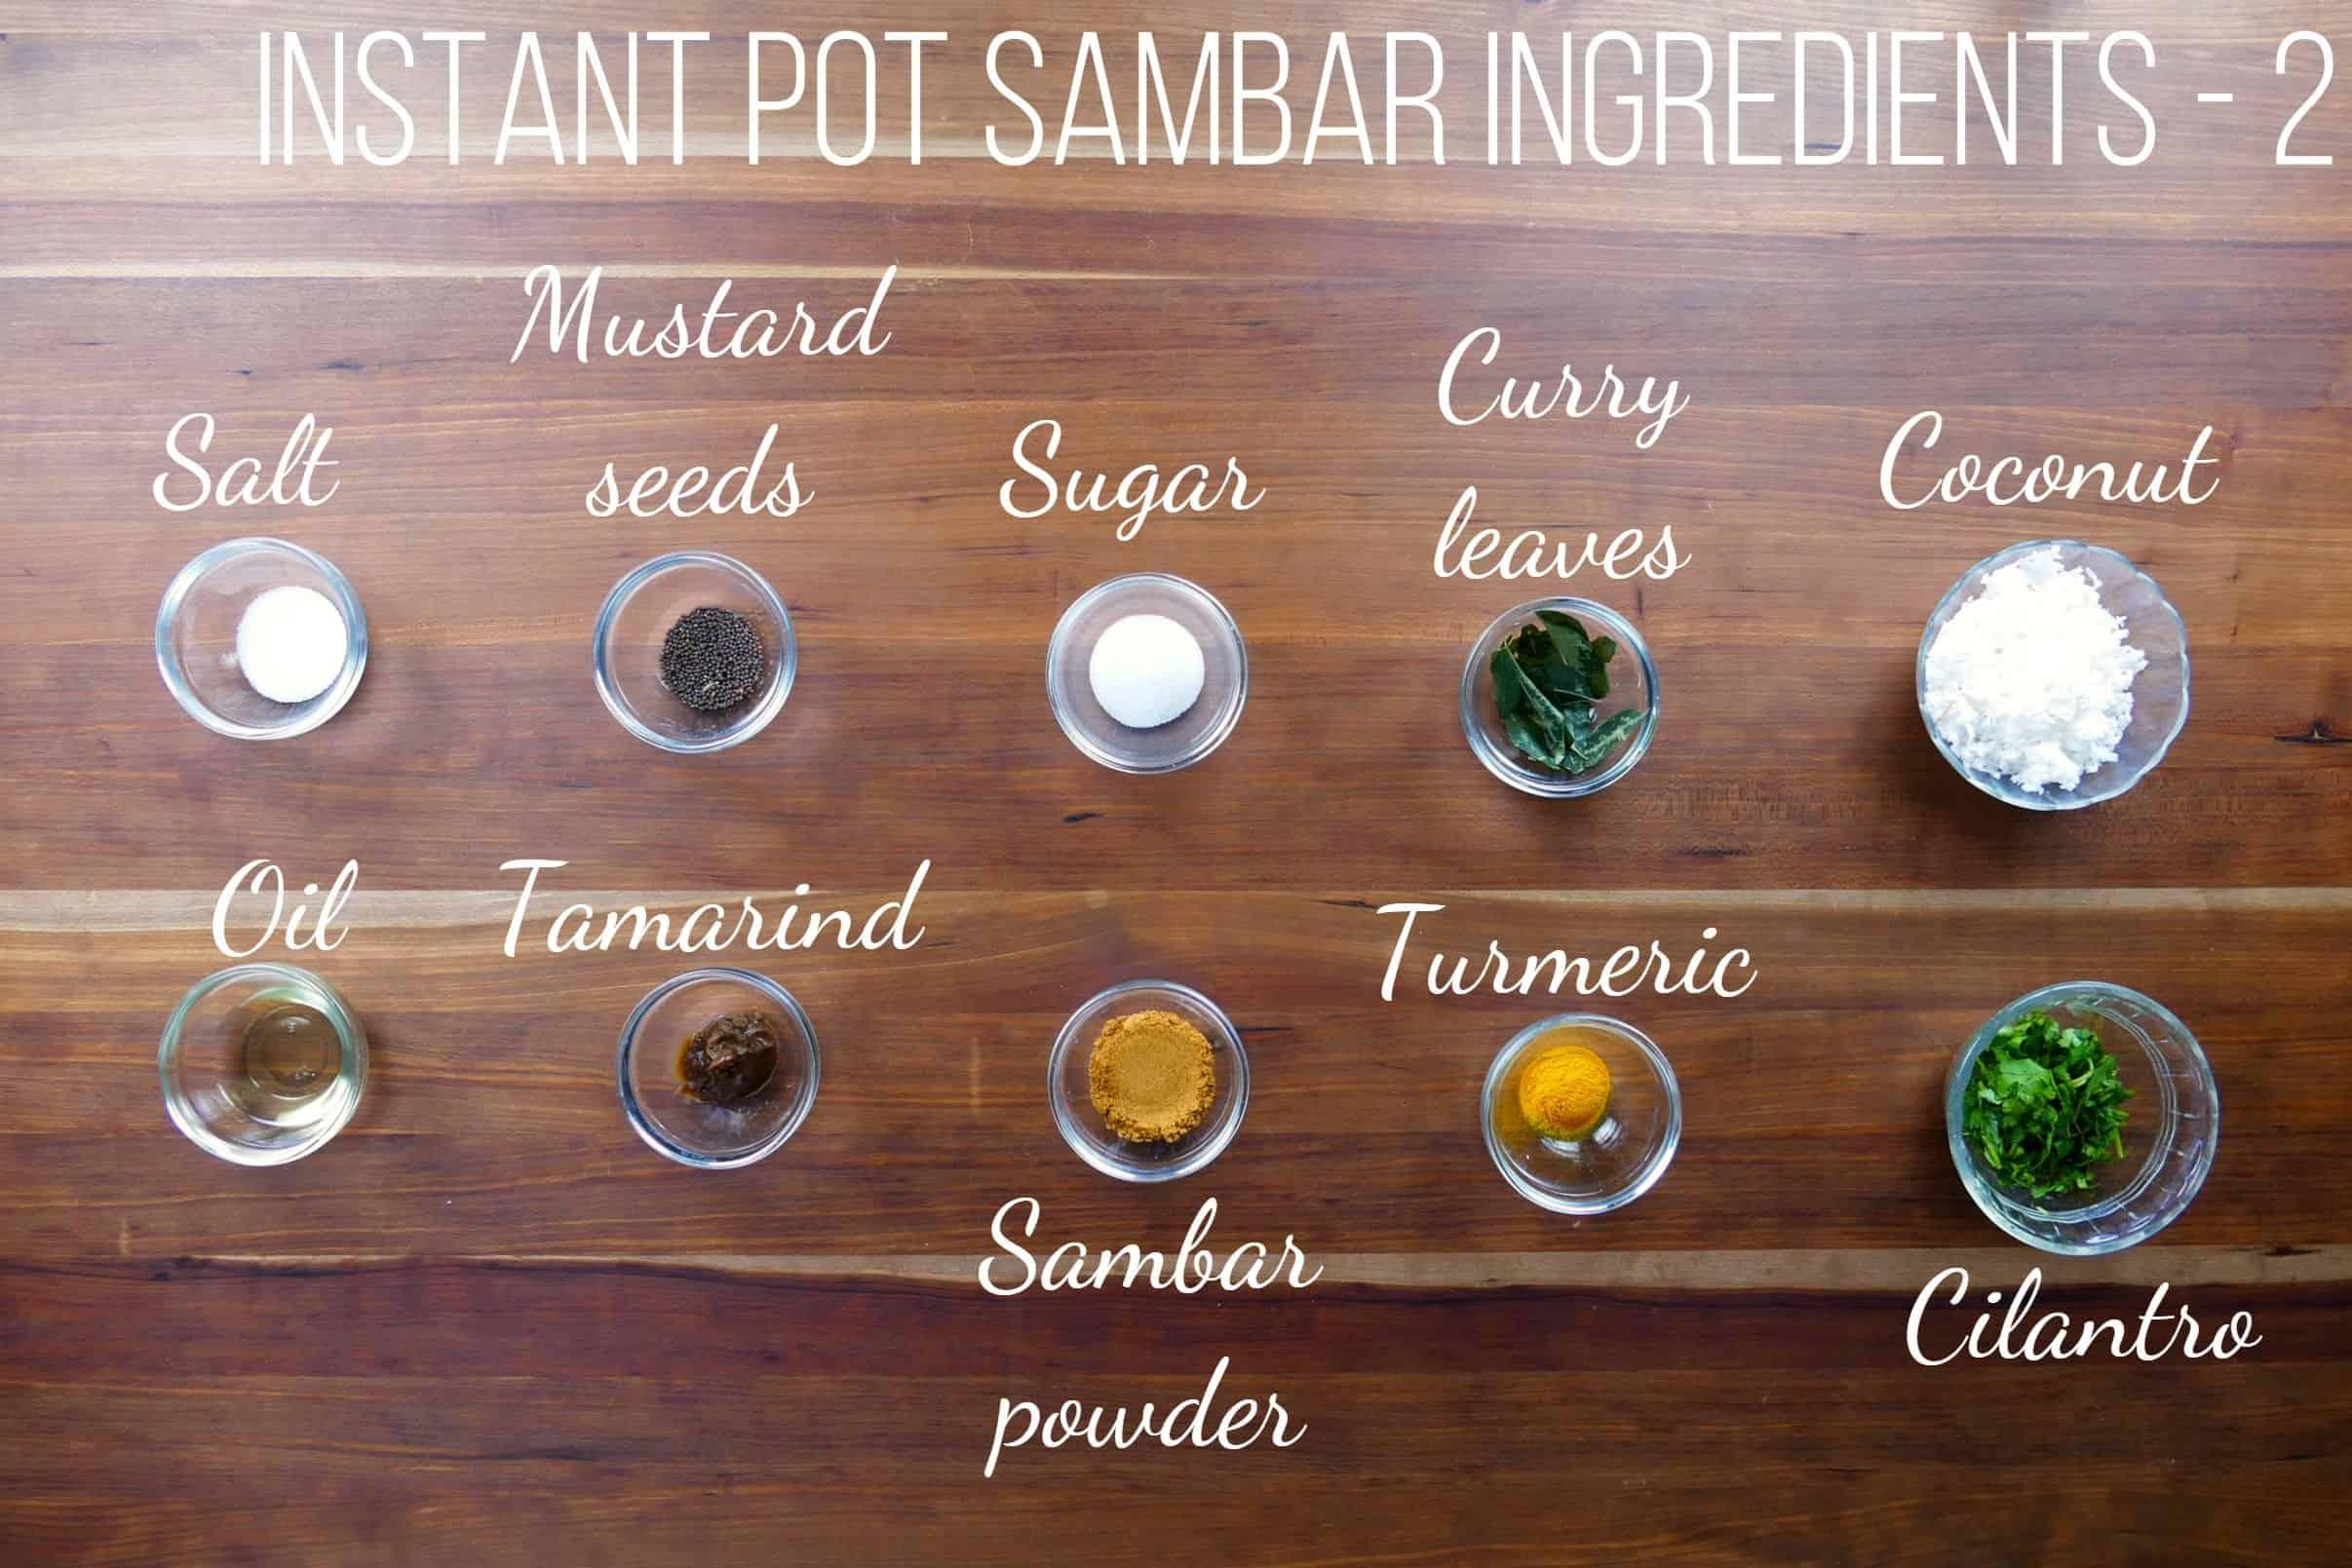 Instant Pot Sambar Ingredients 2 - salt, mustard seeds, sugar, curry leaves, coconut, oil, tamarind, sambar powder, turmeric, cilantro